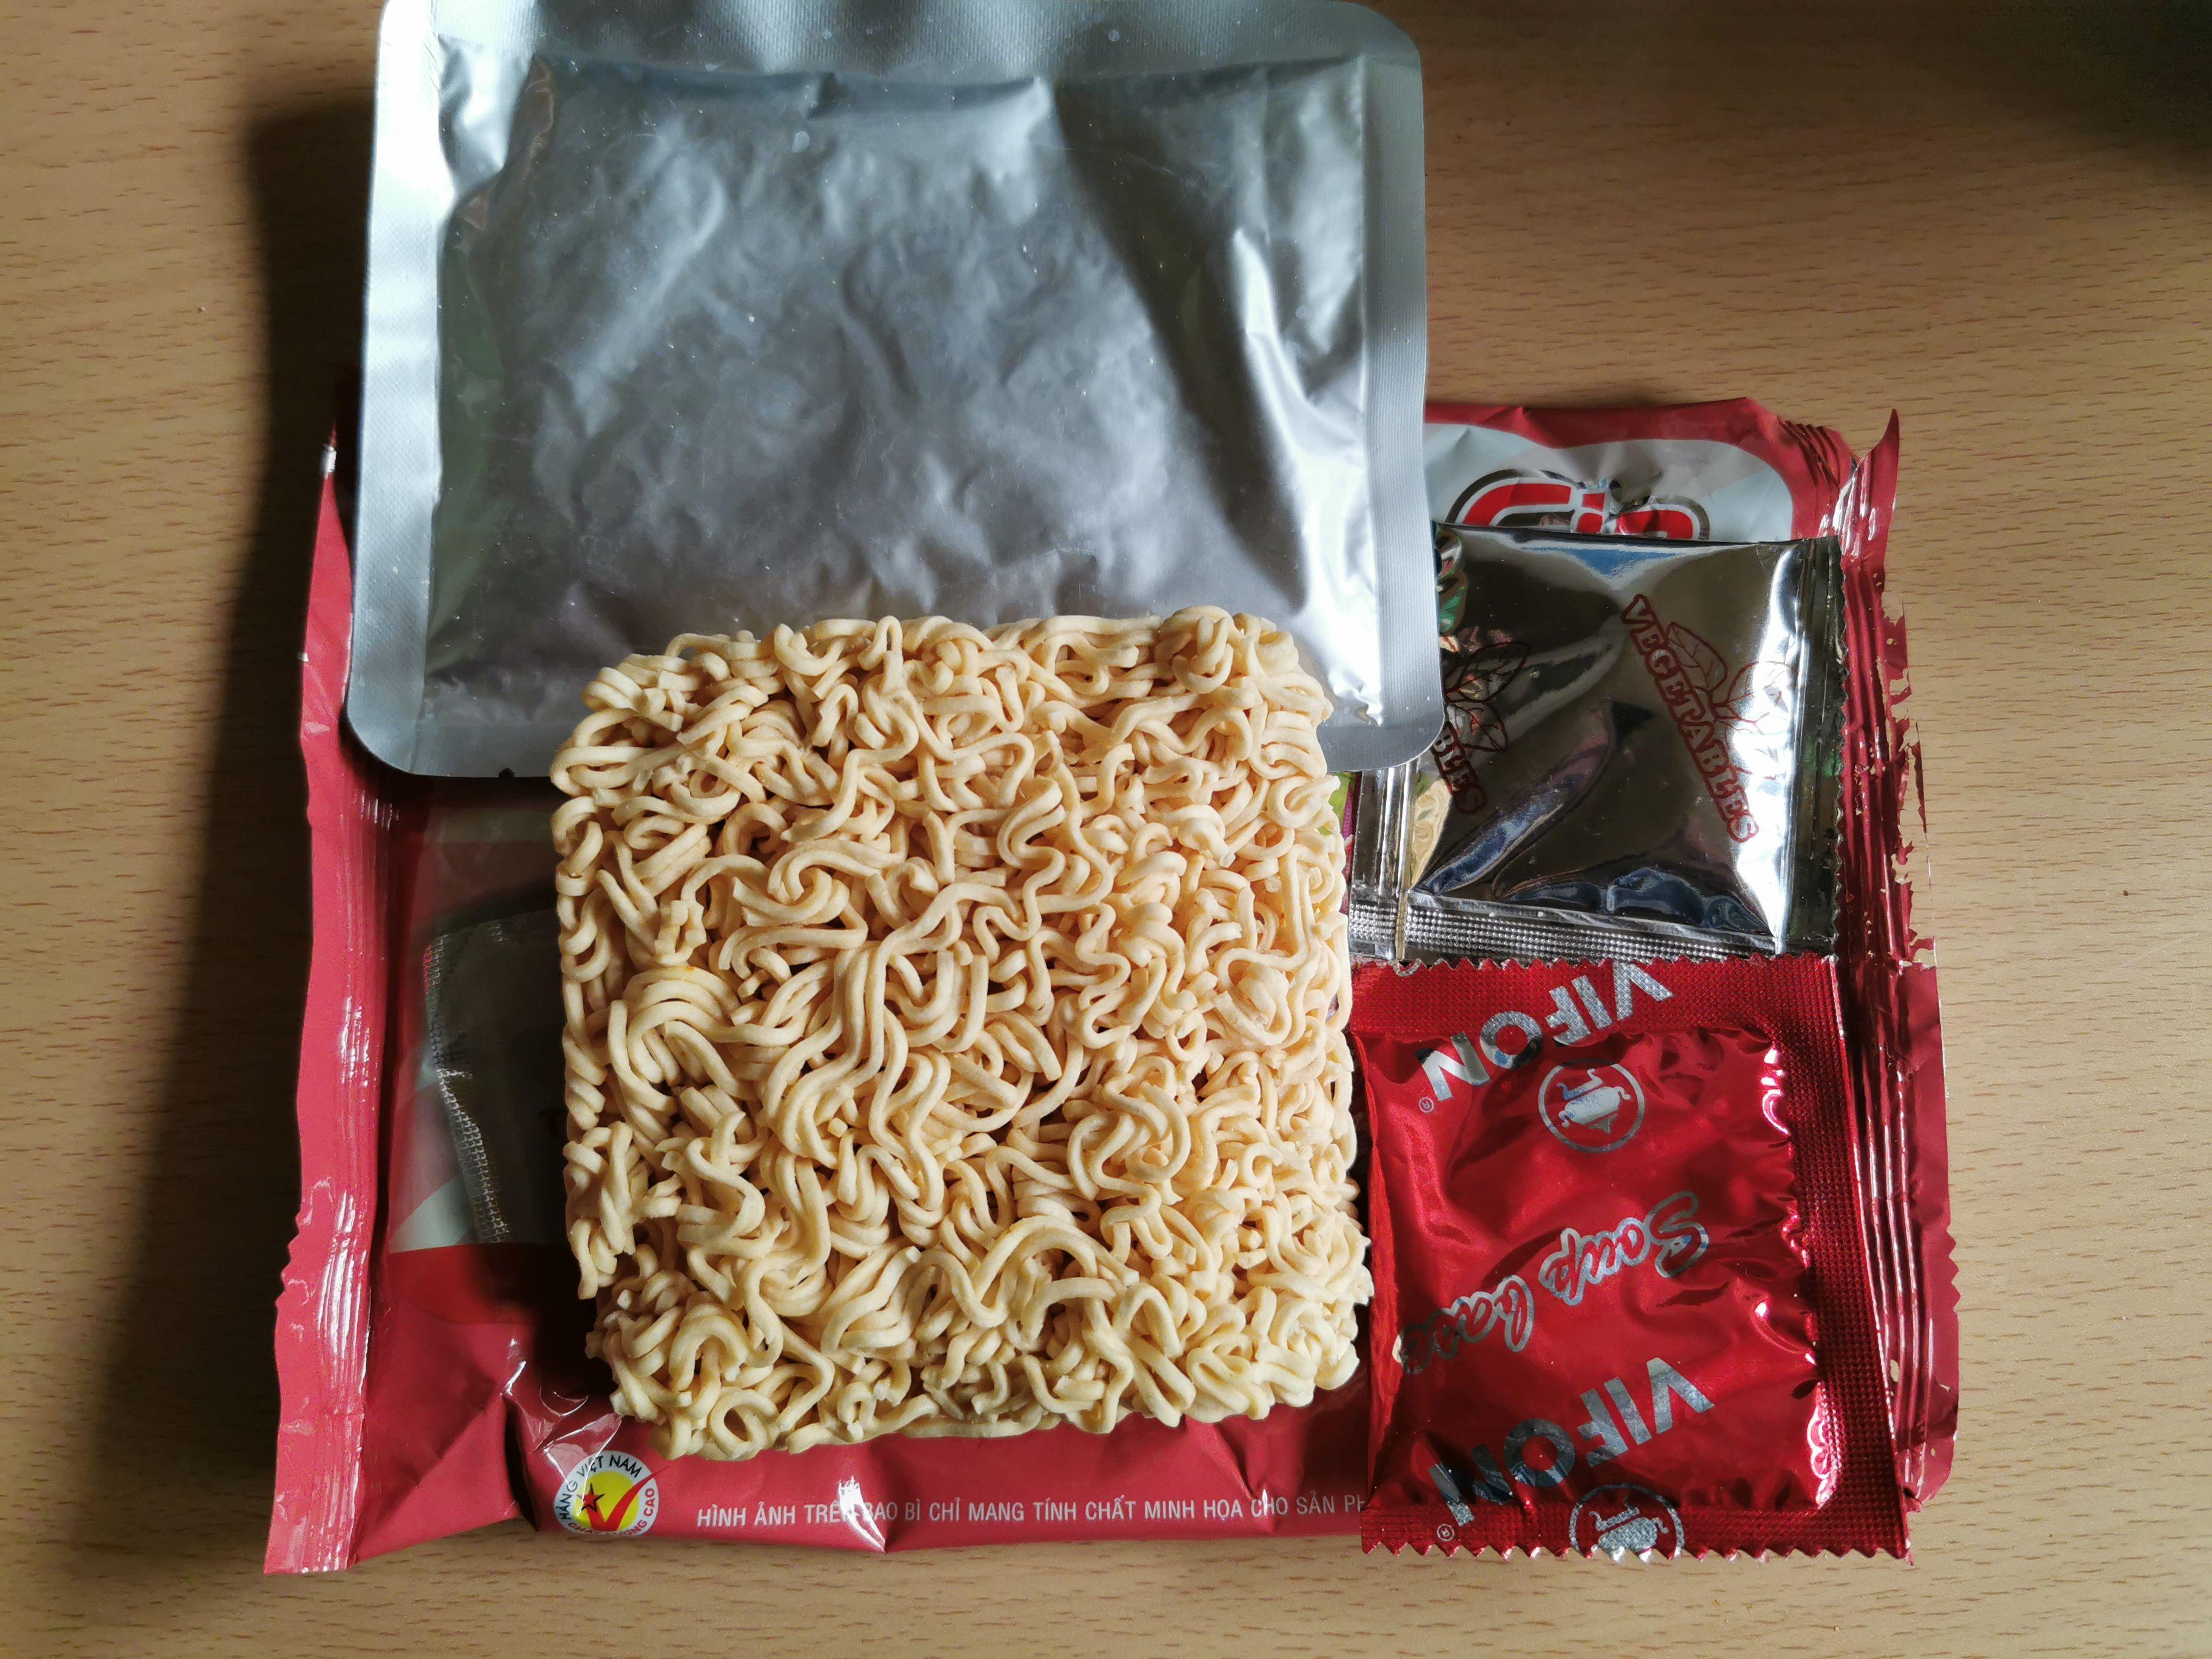 "#1954: Vifon""Hoàng Gia Mì Thịt Bò (Hoang Gia Instant Noodles with Beef)"""